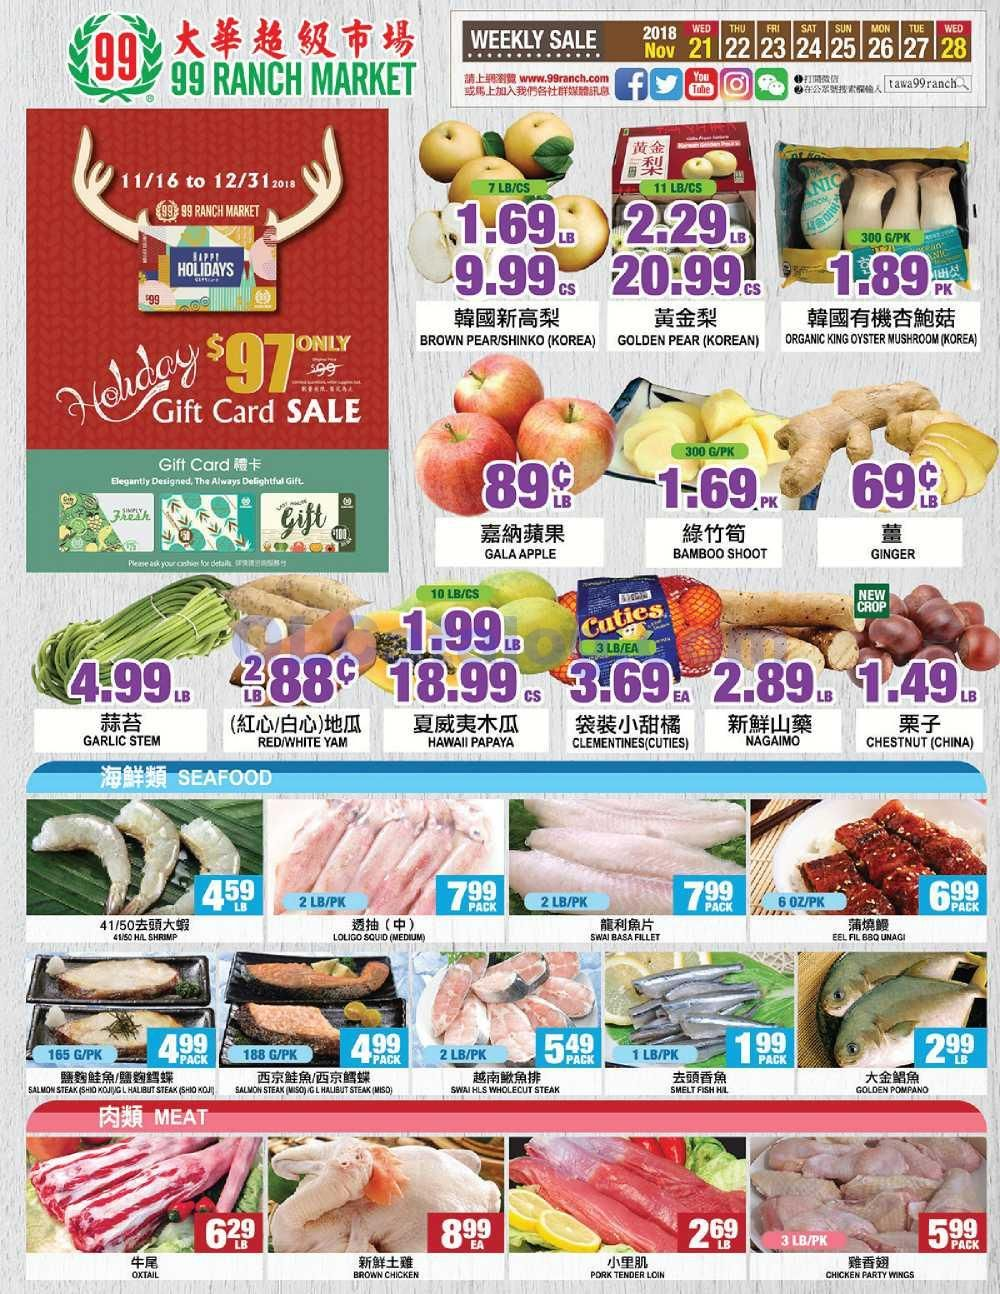 99 Ranch Market Weekly ad November 21 28, 2018. View the